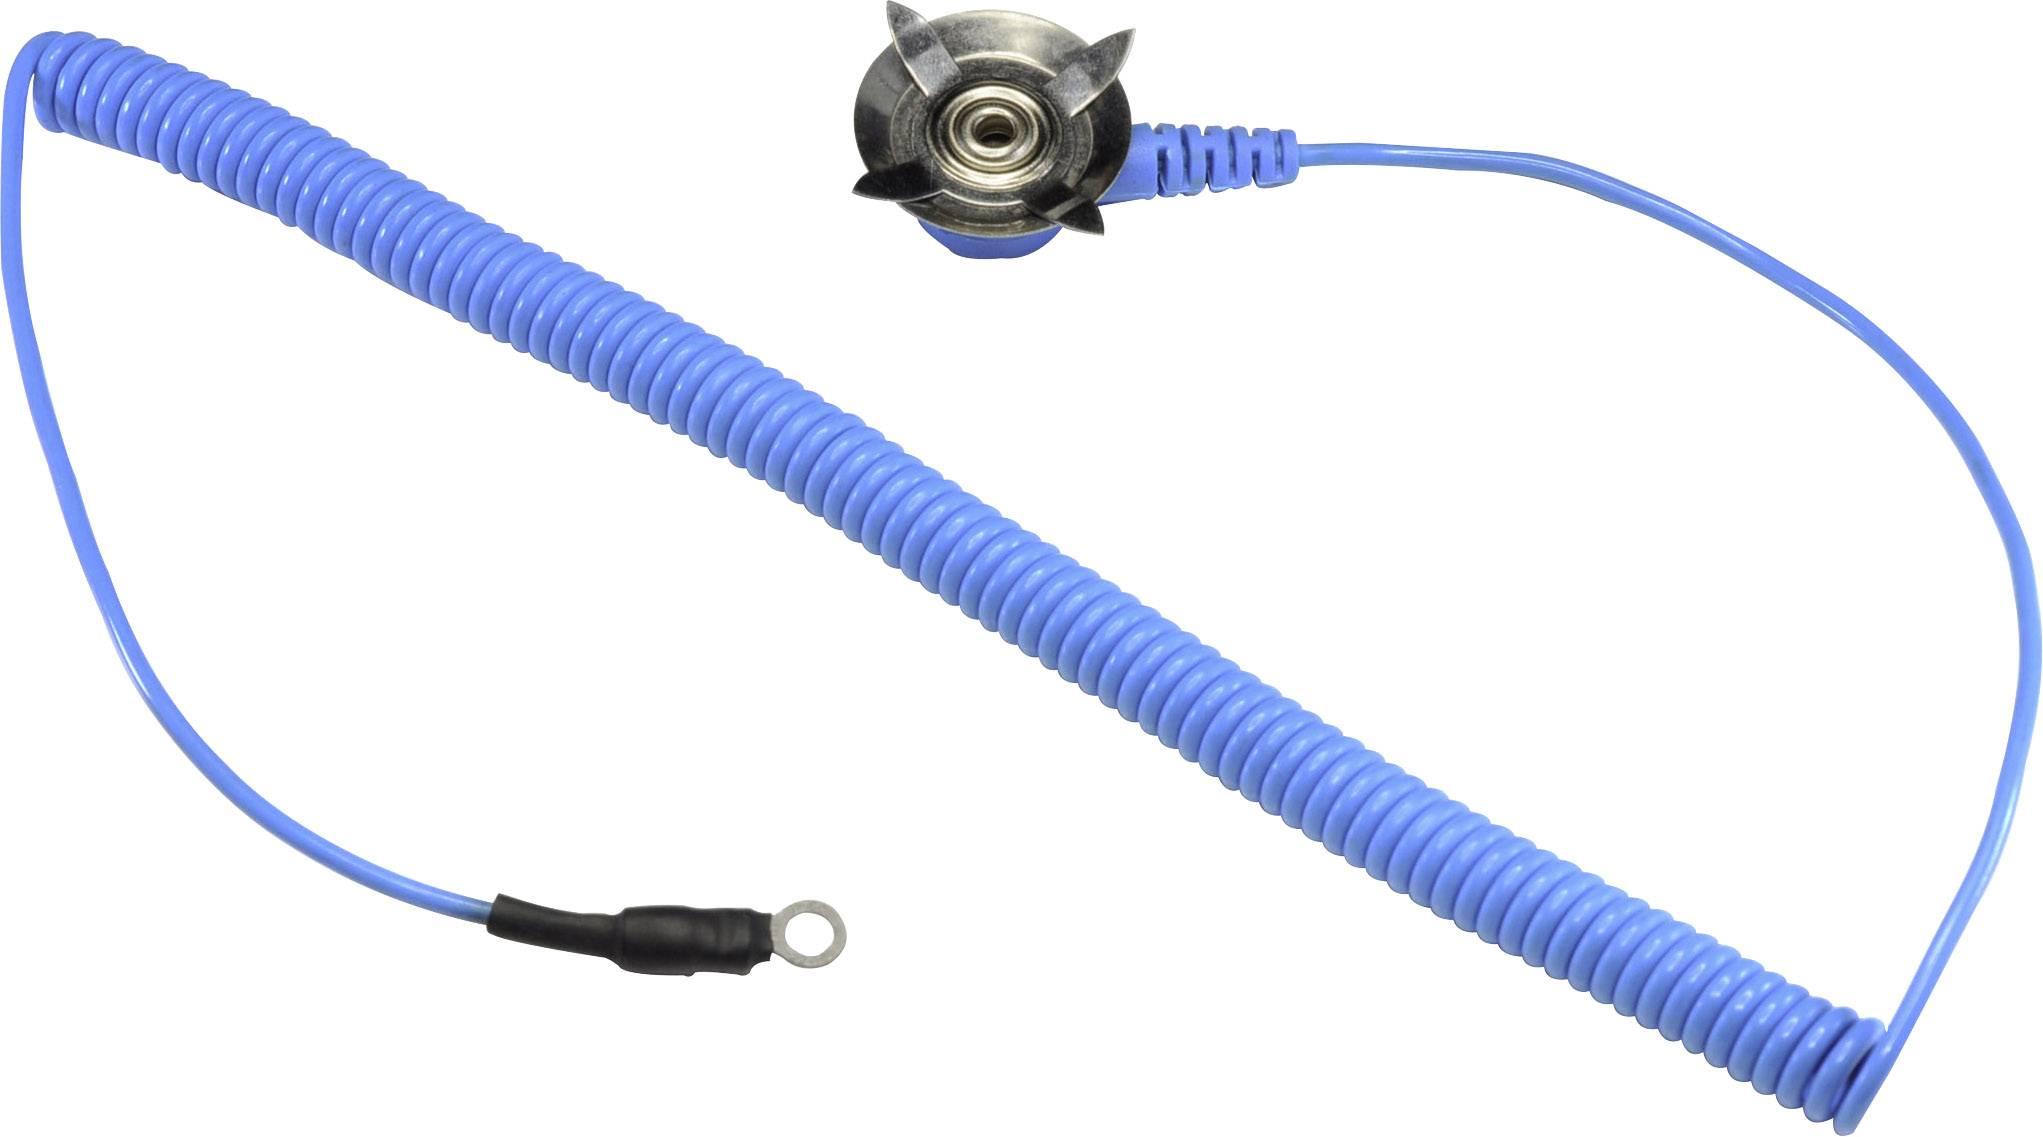 ESD uzemňovací kábel k rohožke Conrad Components EkA-183-AD-R, 1.83 m